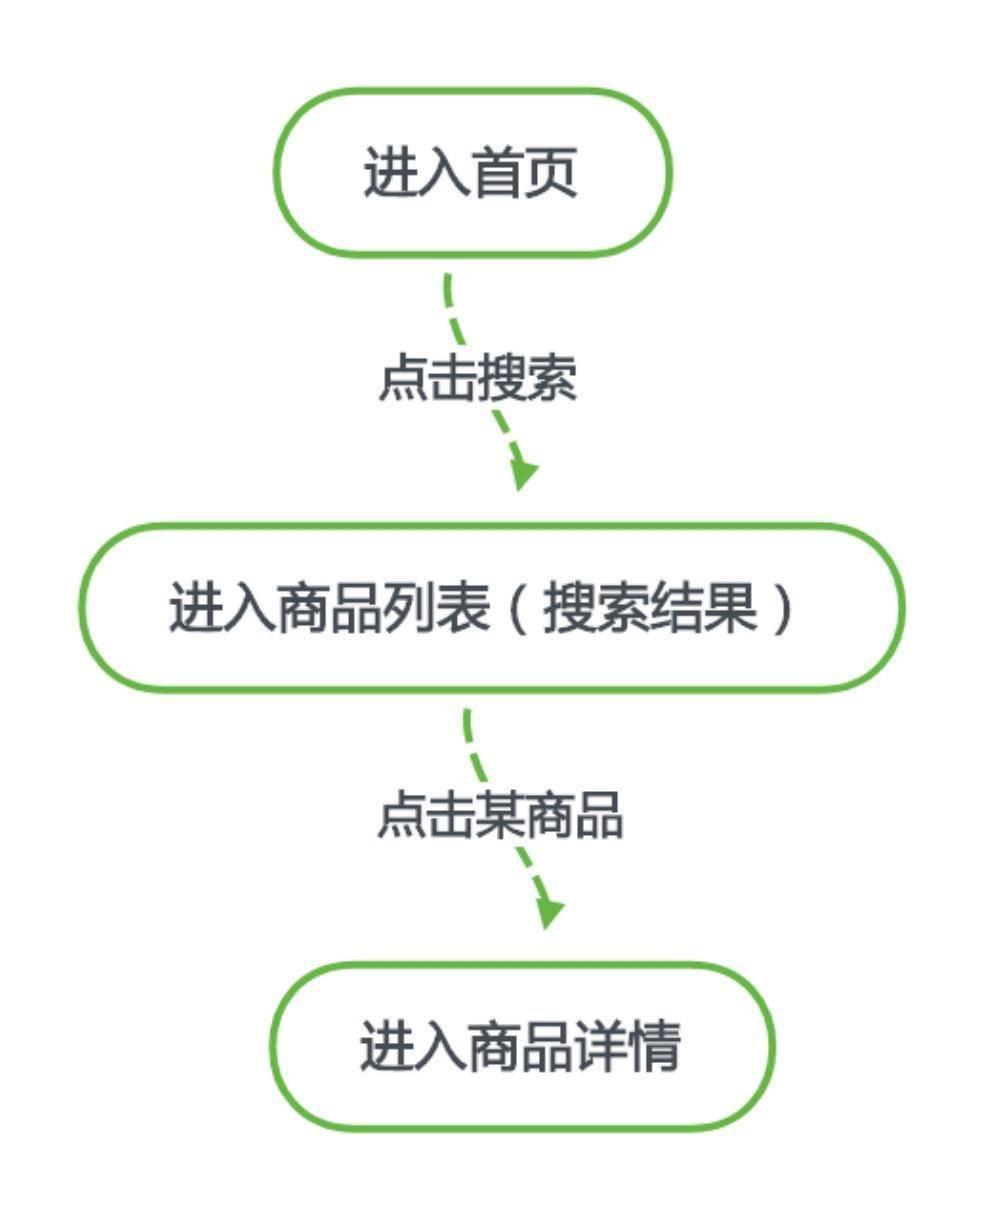 案例流程.png